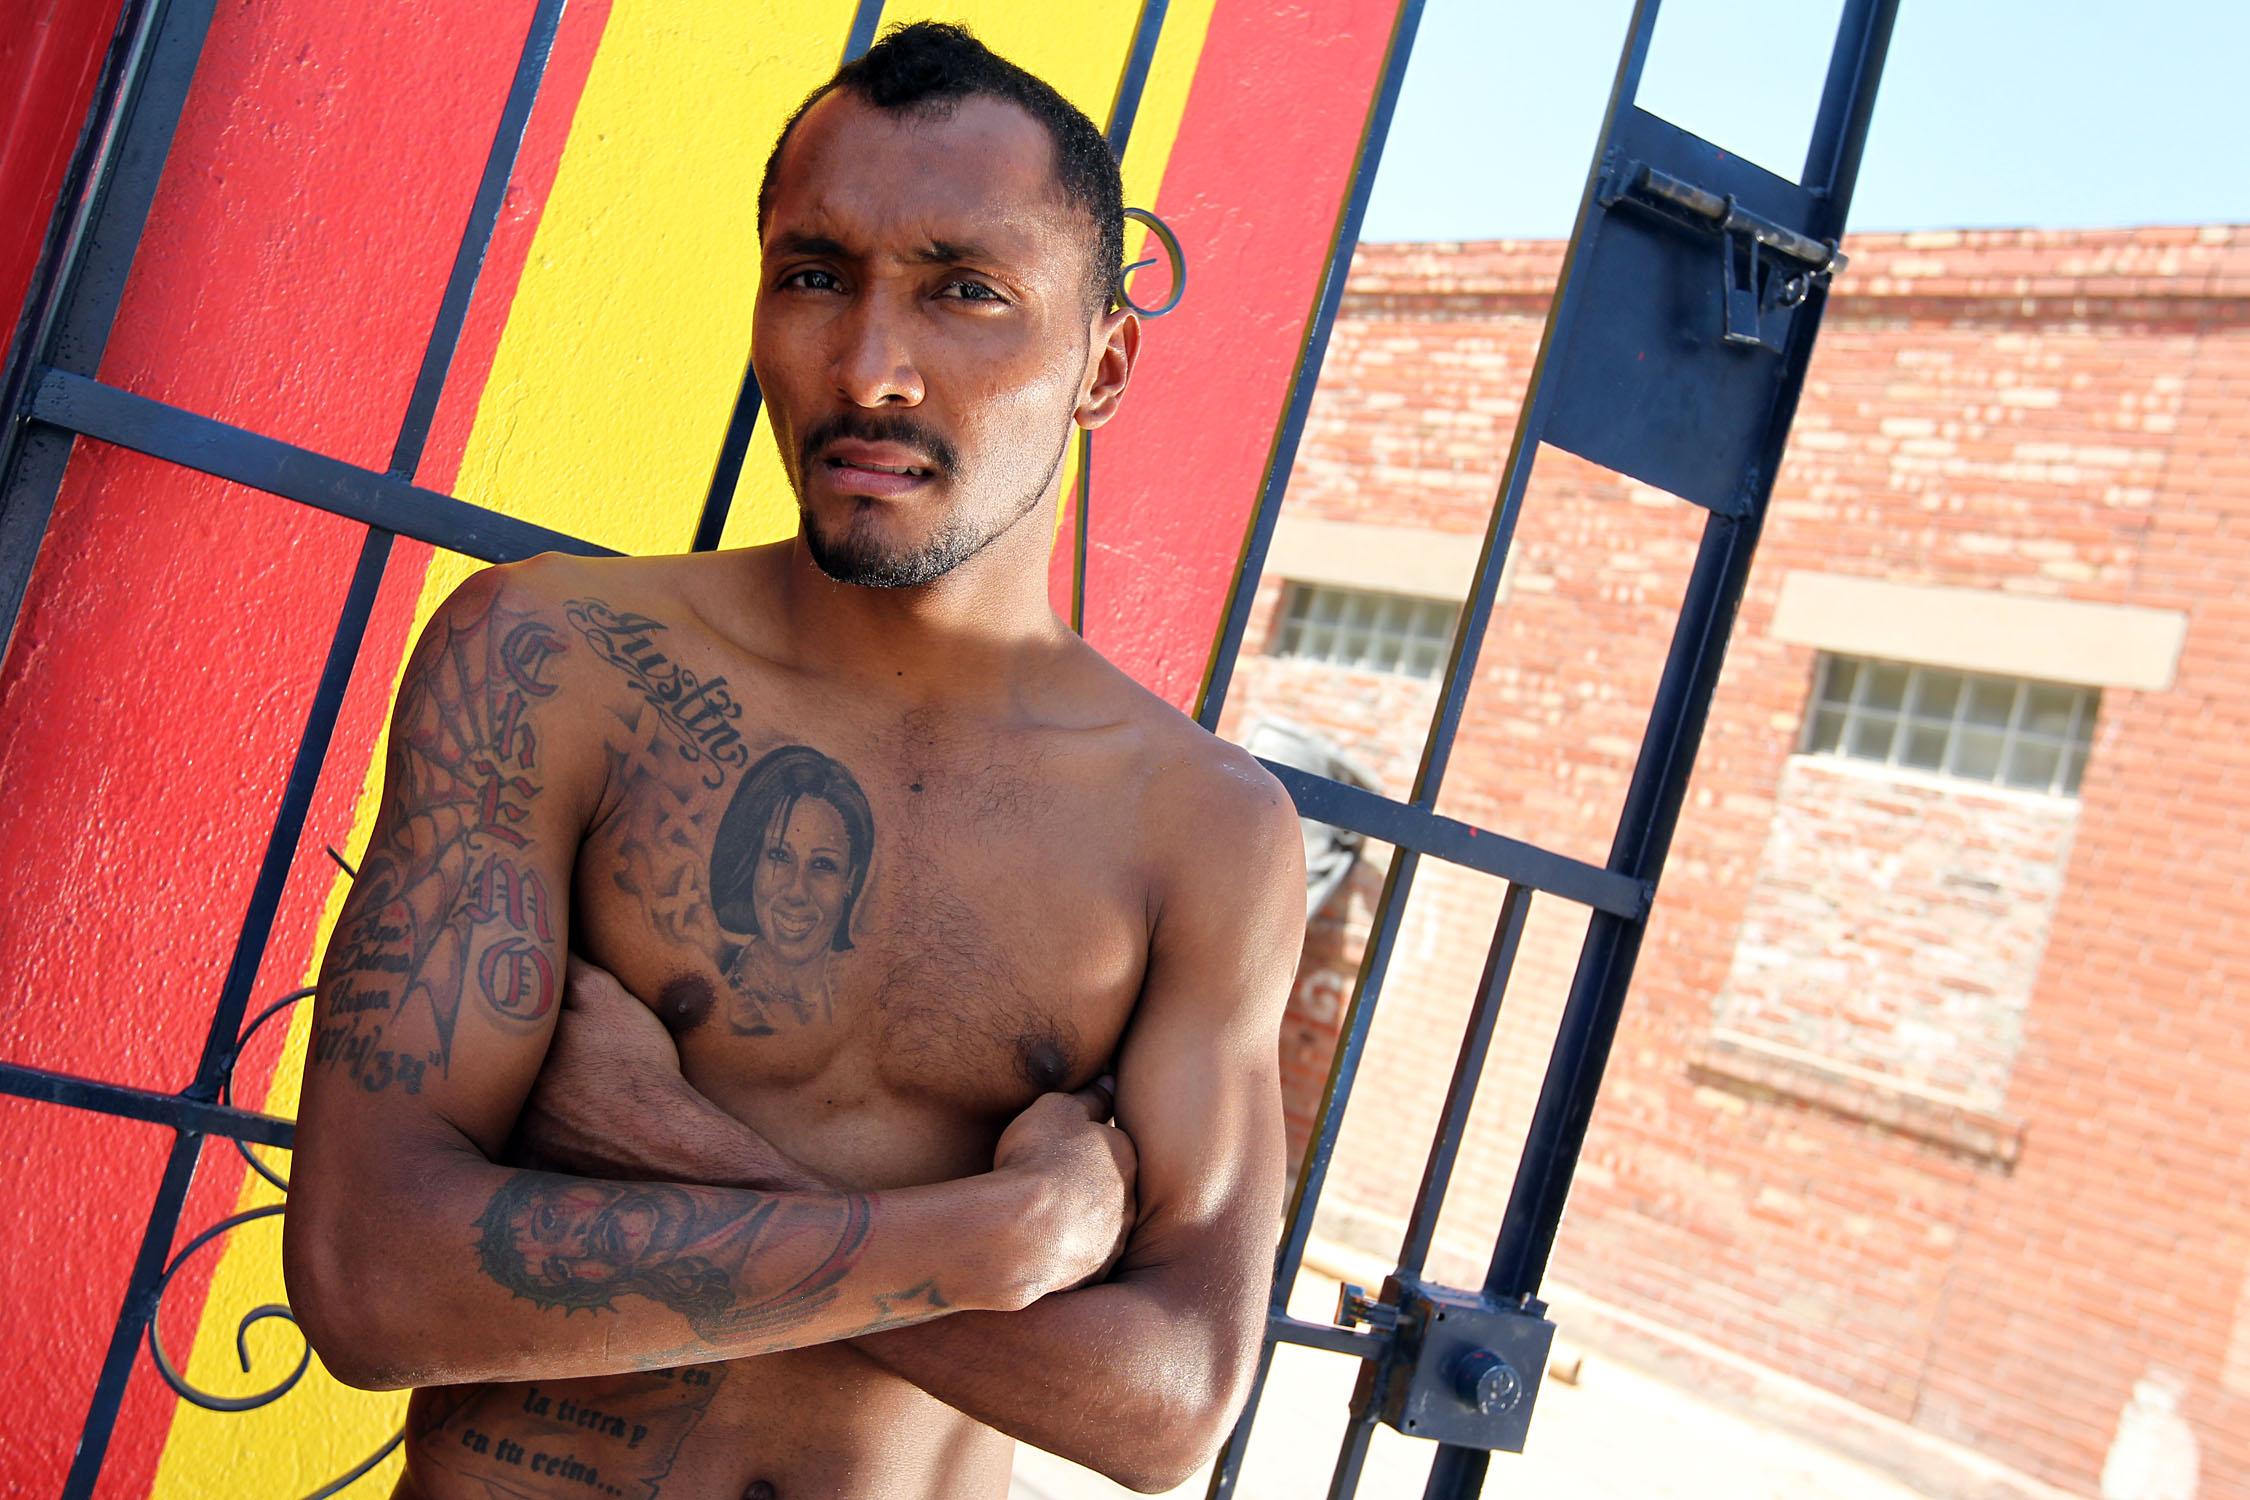 Combate de Chemito Moreno vs. Sor Rungvisai será el 30 de abril